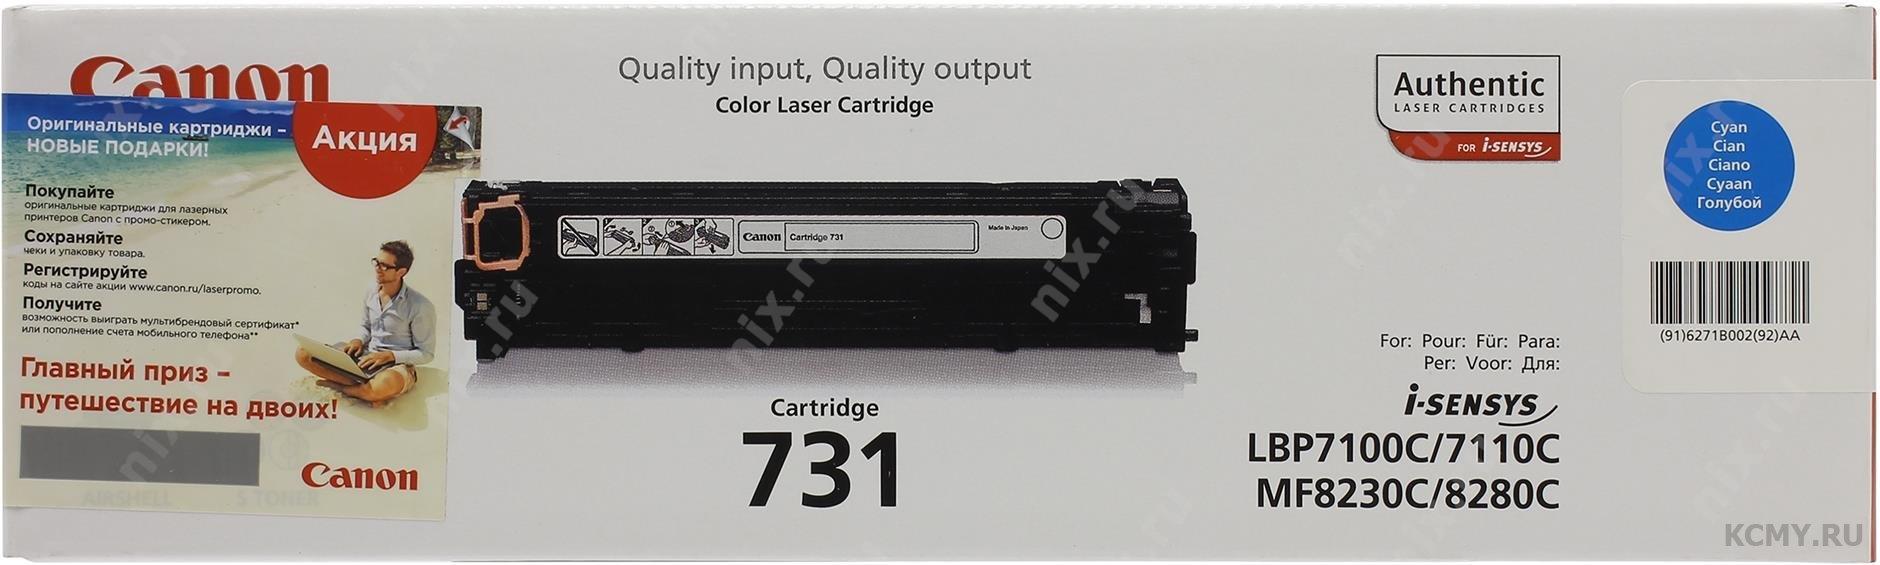 Canon Cartridge 731C, Canon 6271B002